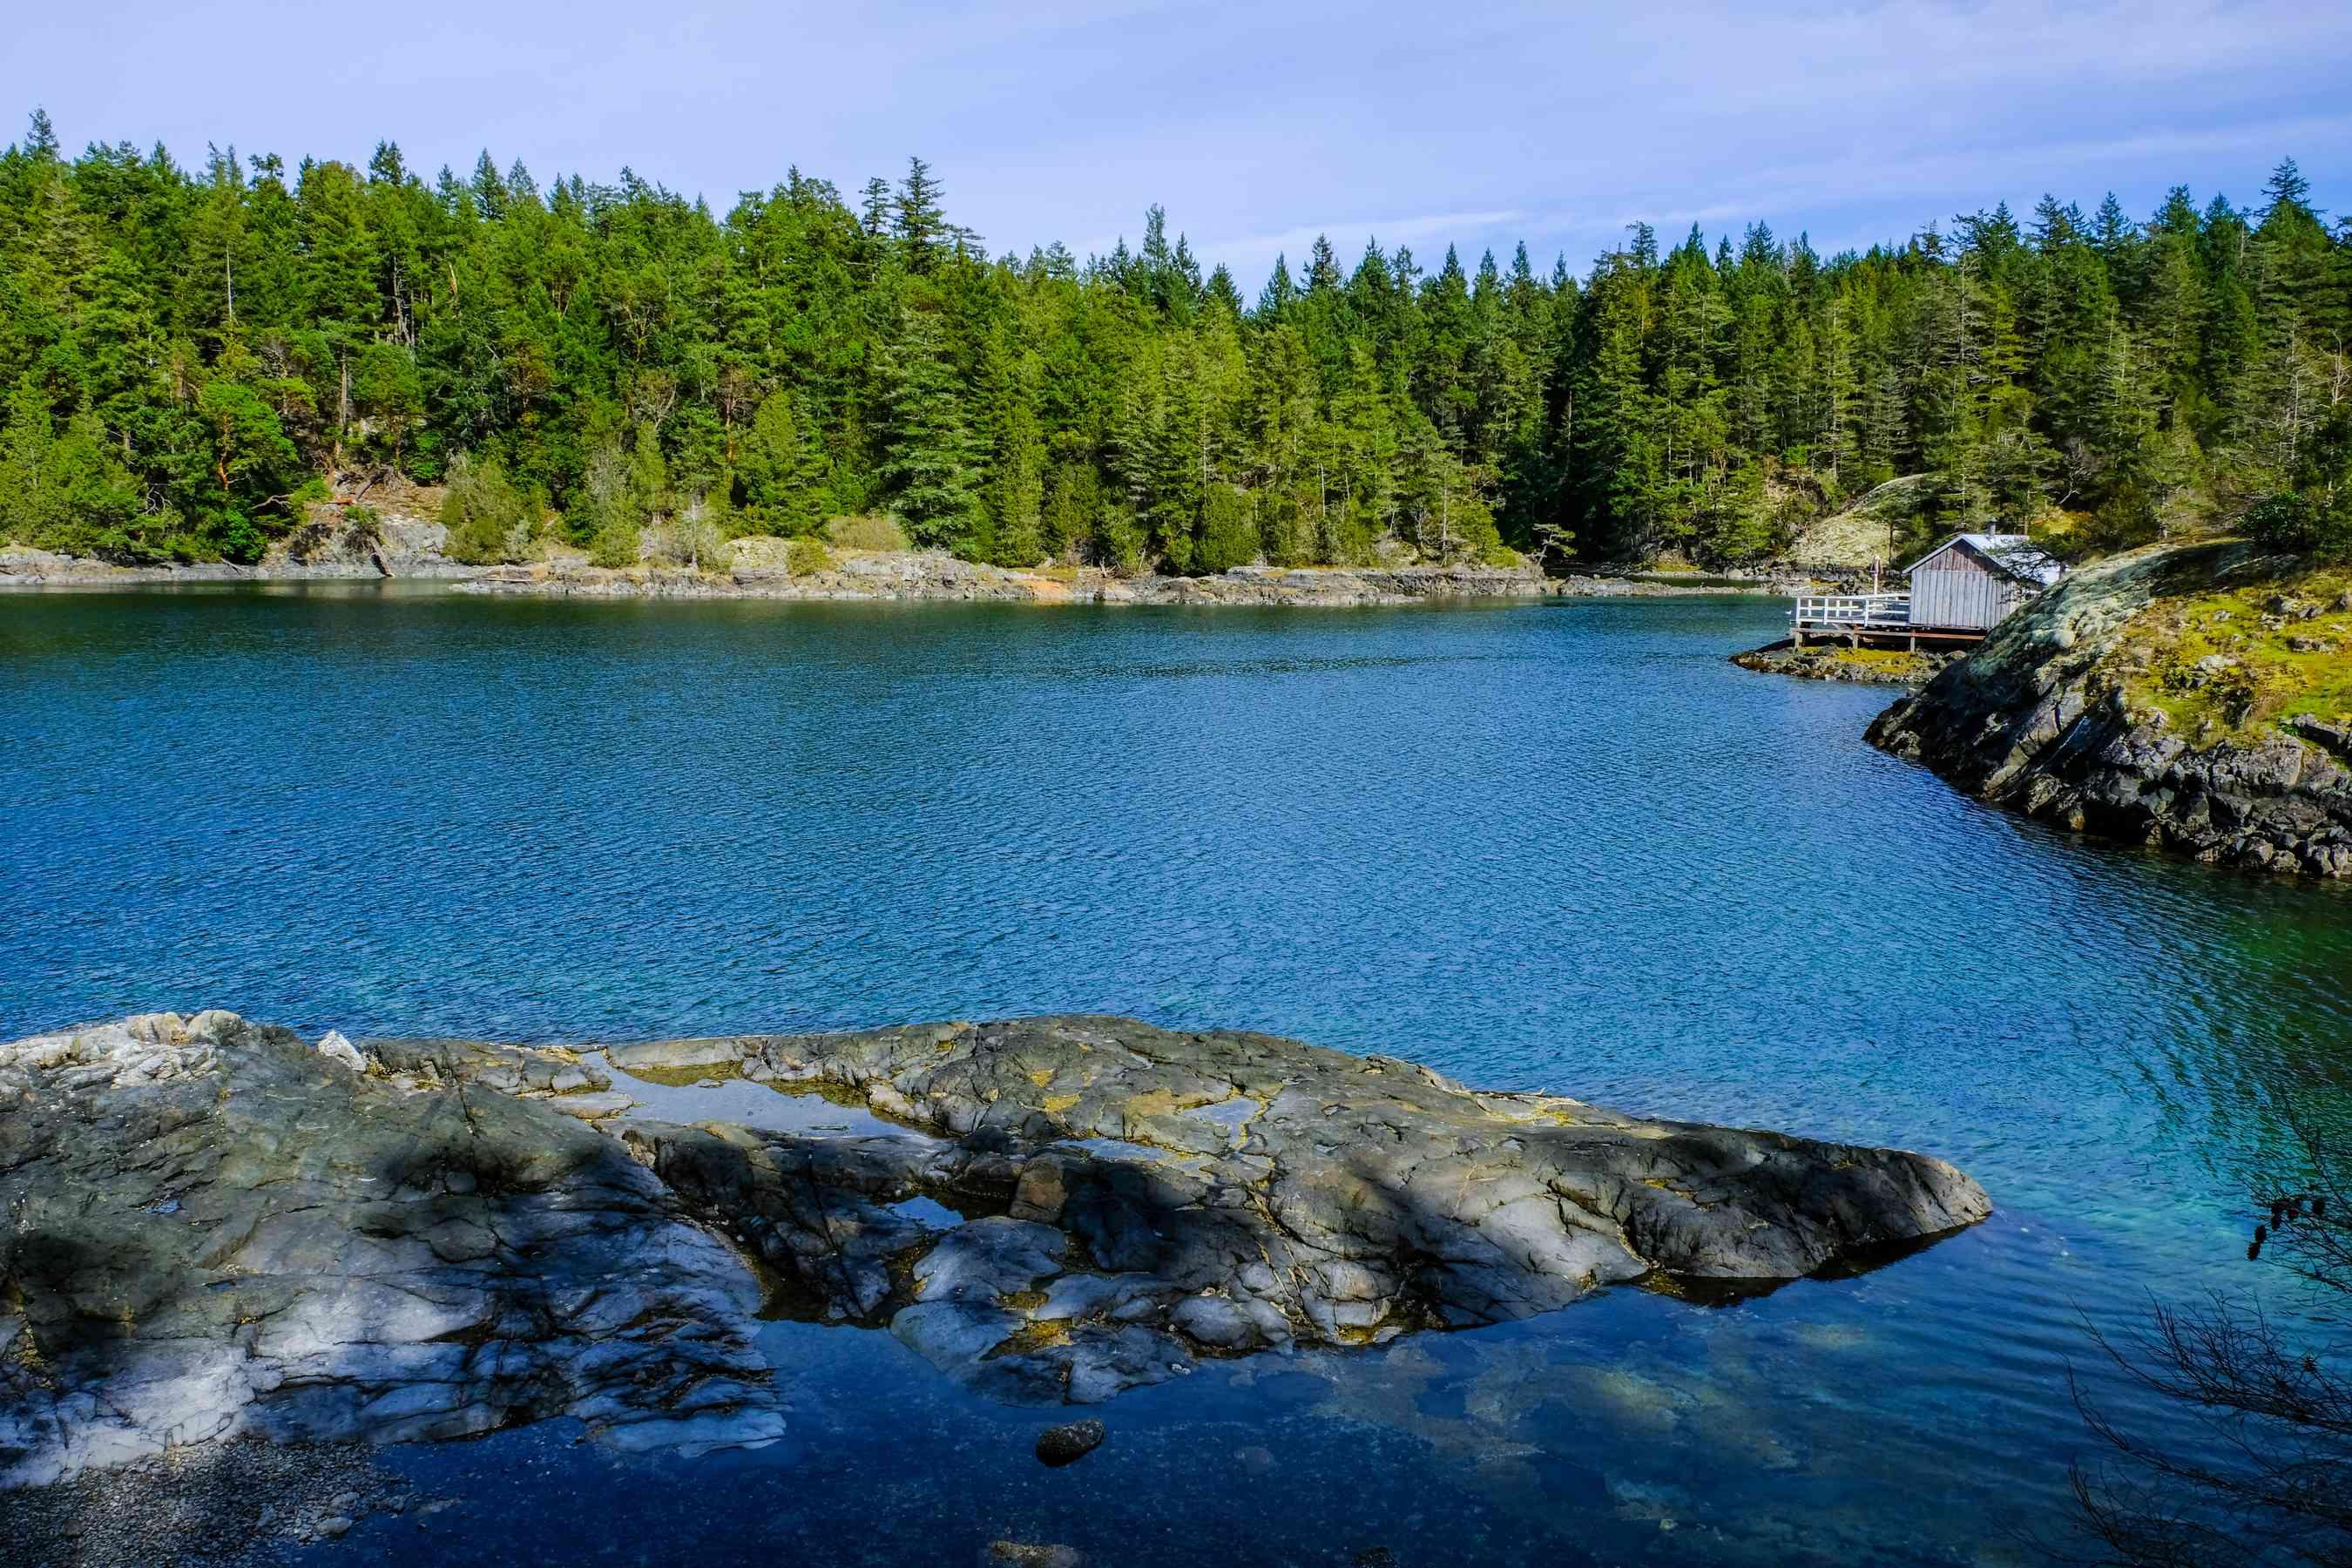 Blue waters on the Sunshine Coast